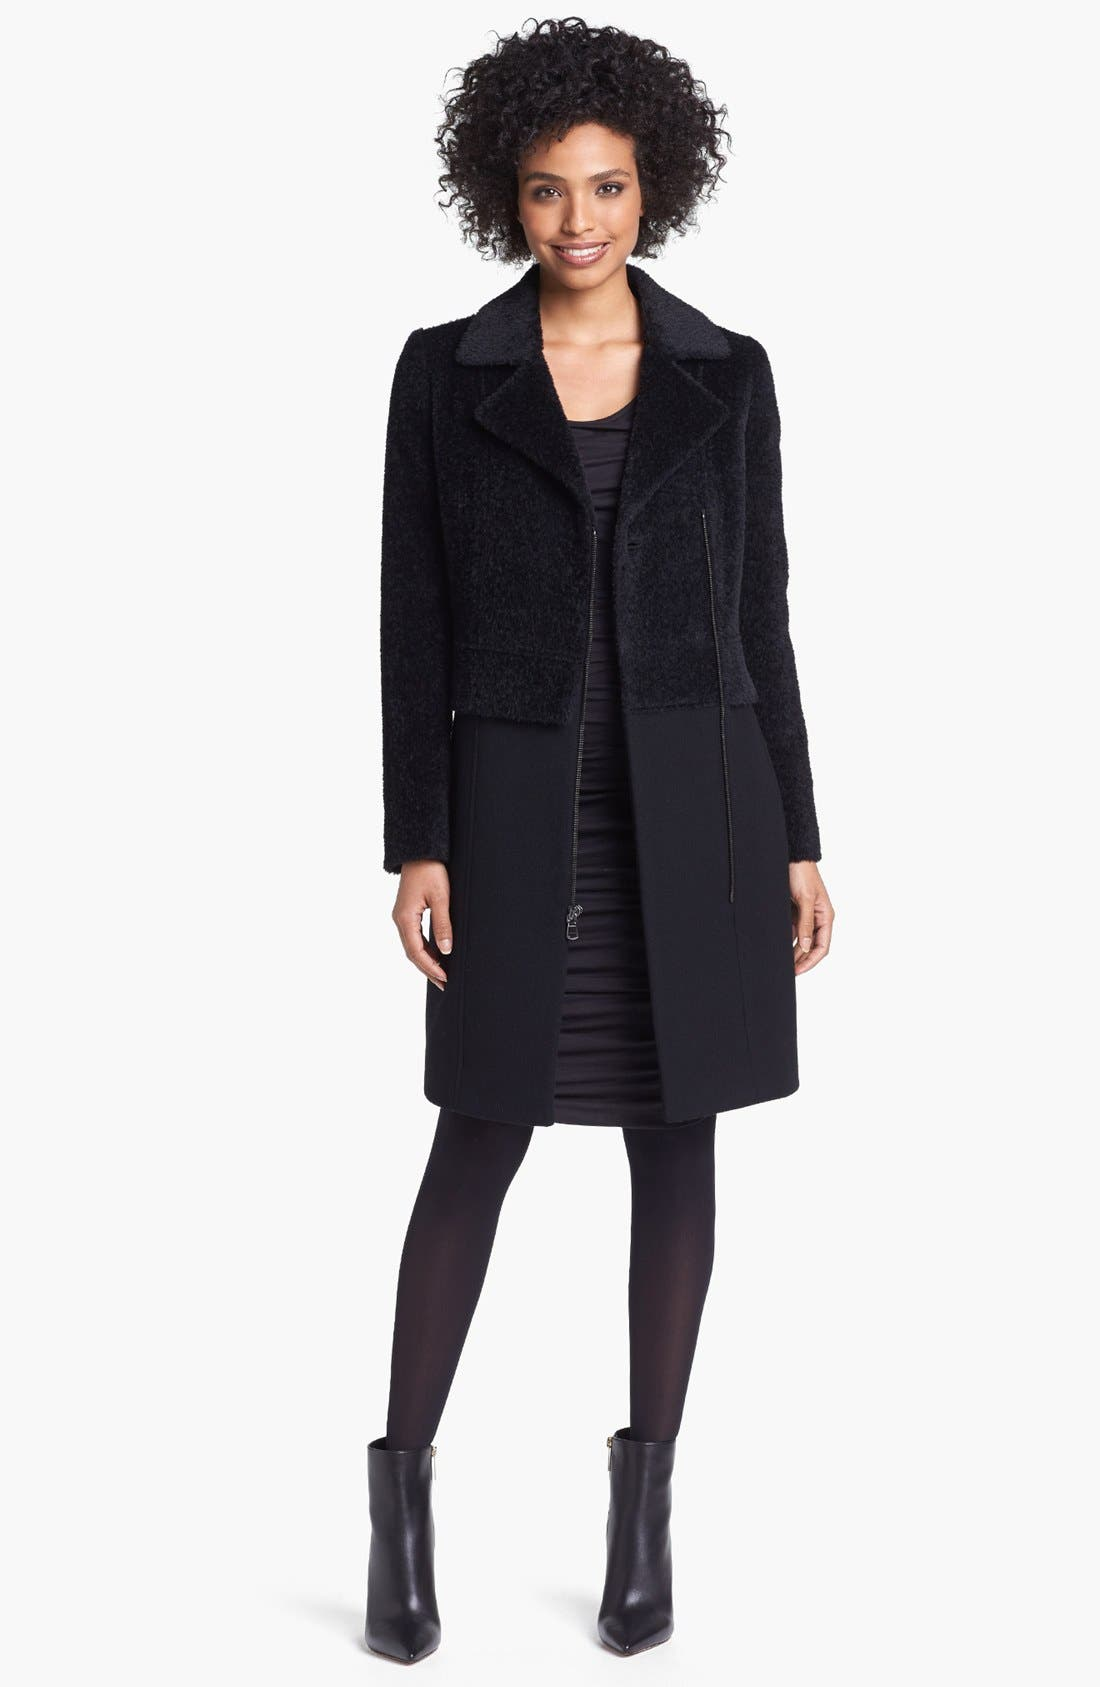 Alternate Image 1 Selected - Trina Turk Asymmetrical Sheared Alpaca & Wool Blend Coat